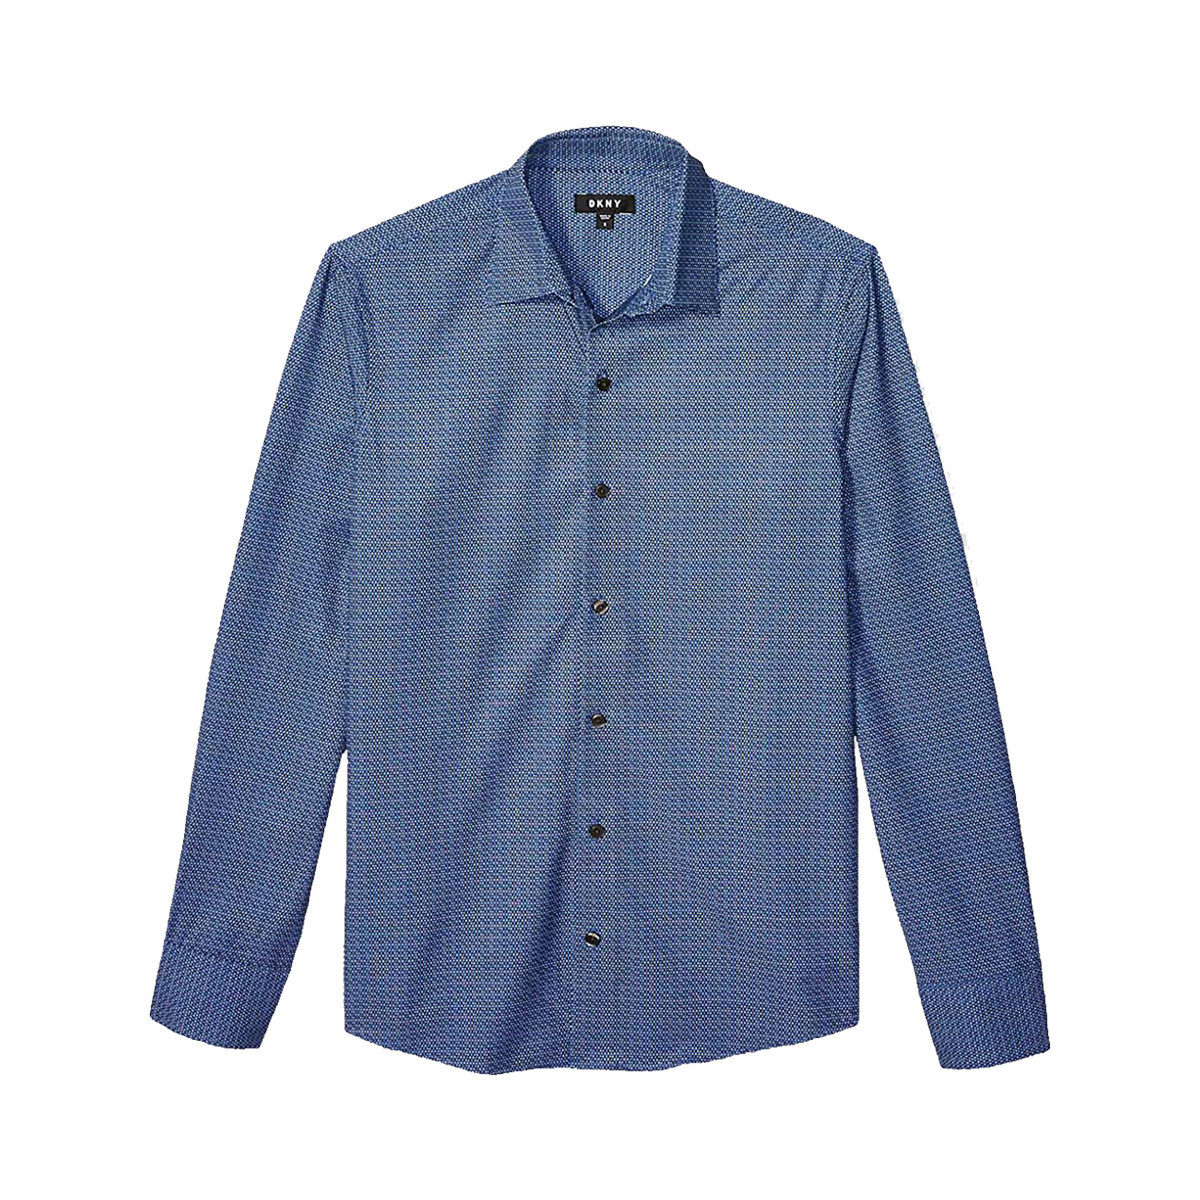 DKNY 唐可娜儿 43MW145402 男士暗纹长袖衬衫